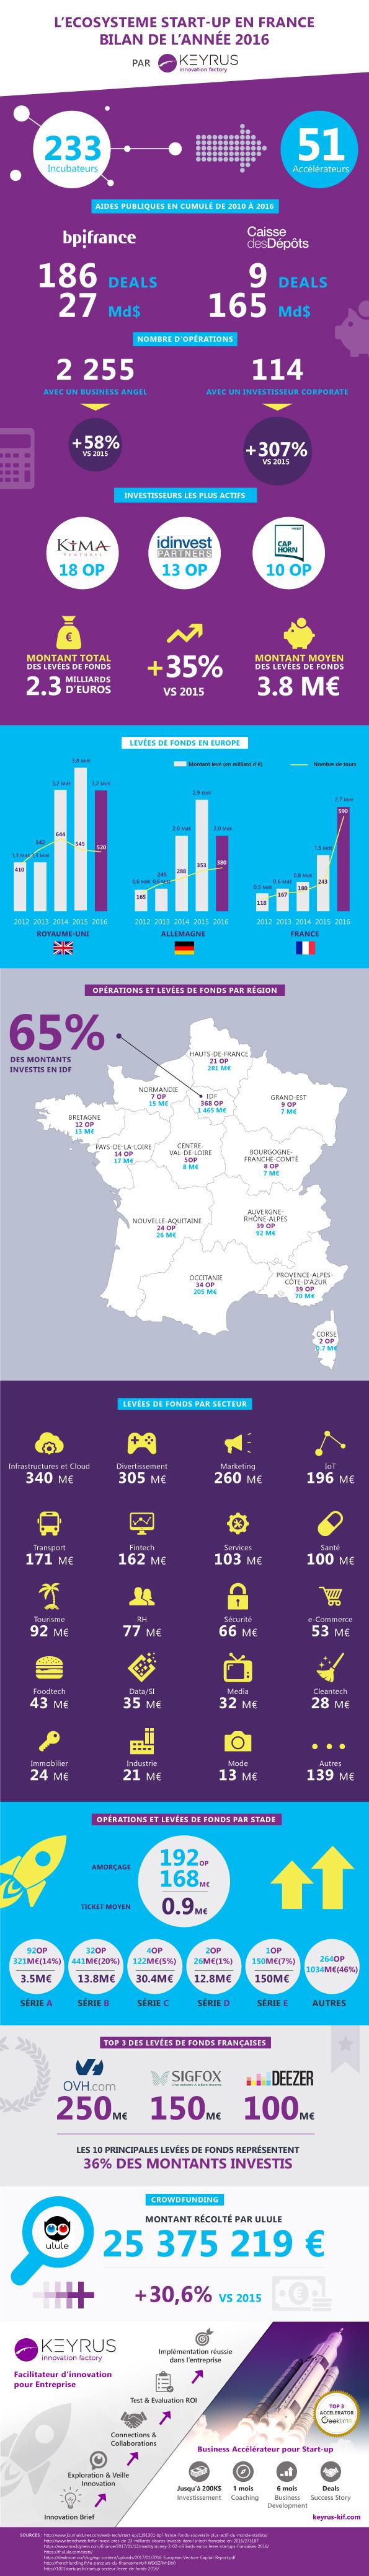 infographie keyrus startups